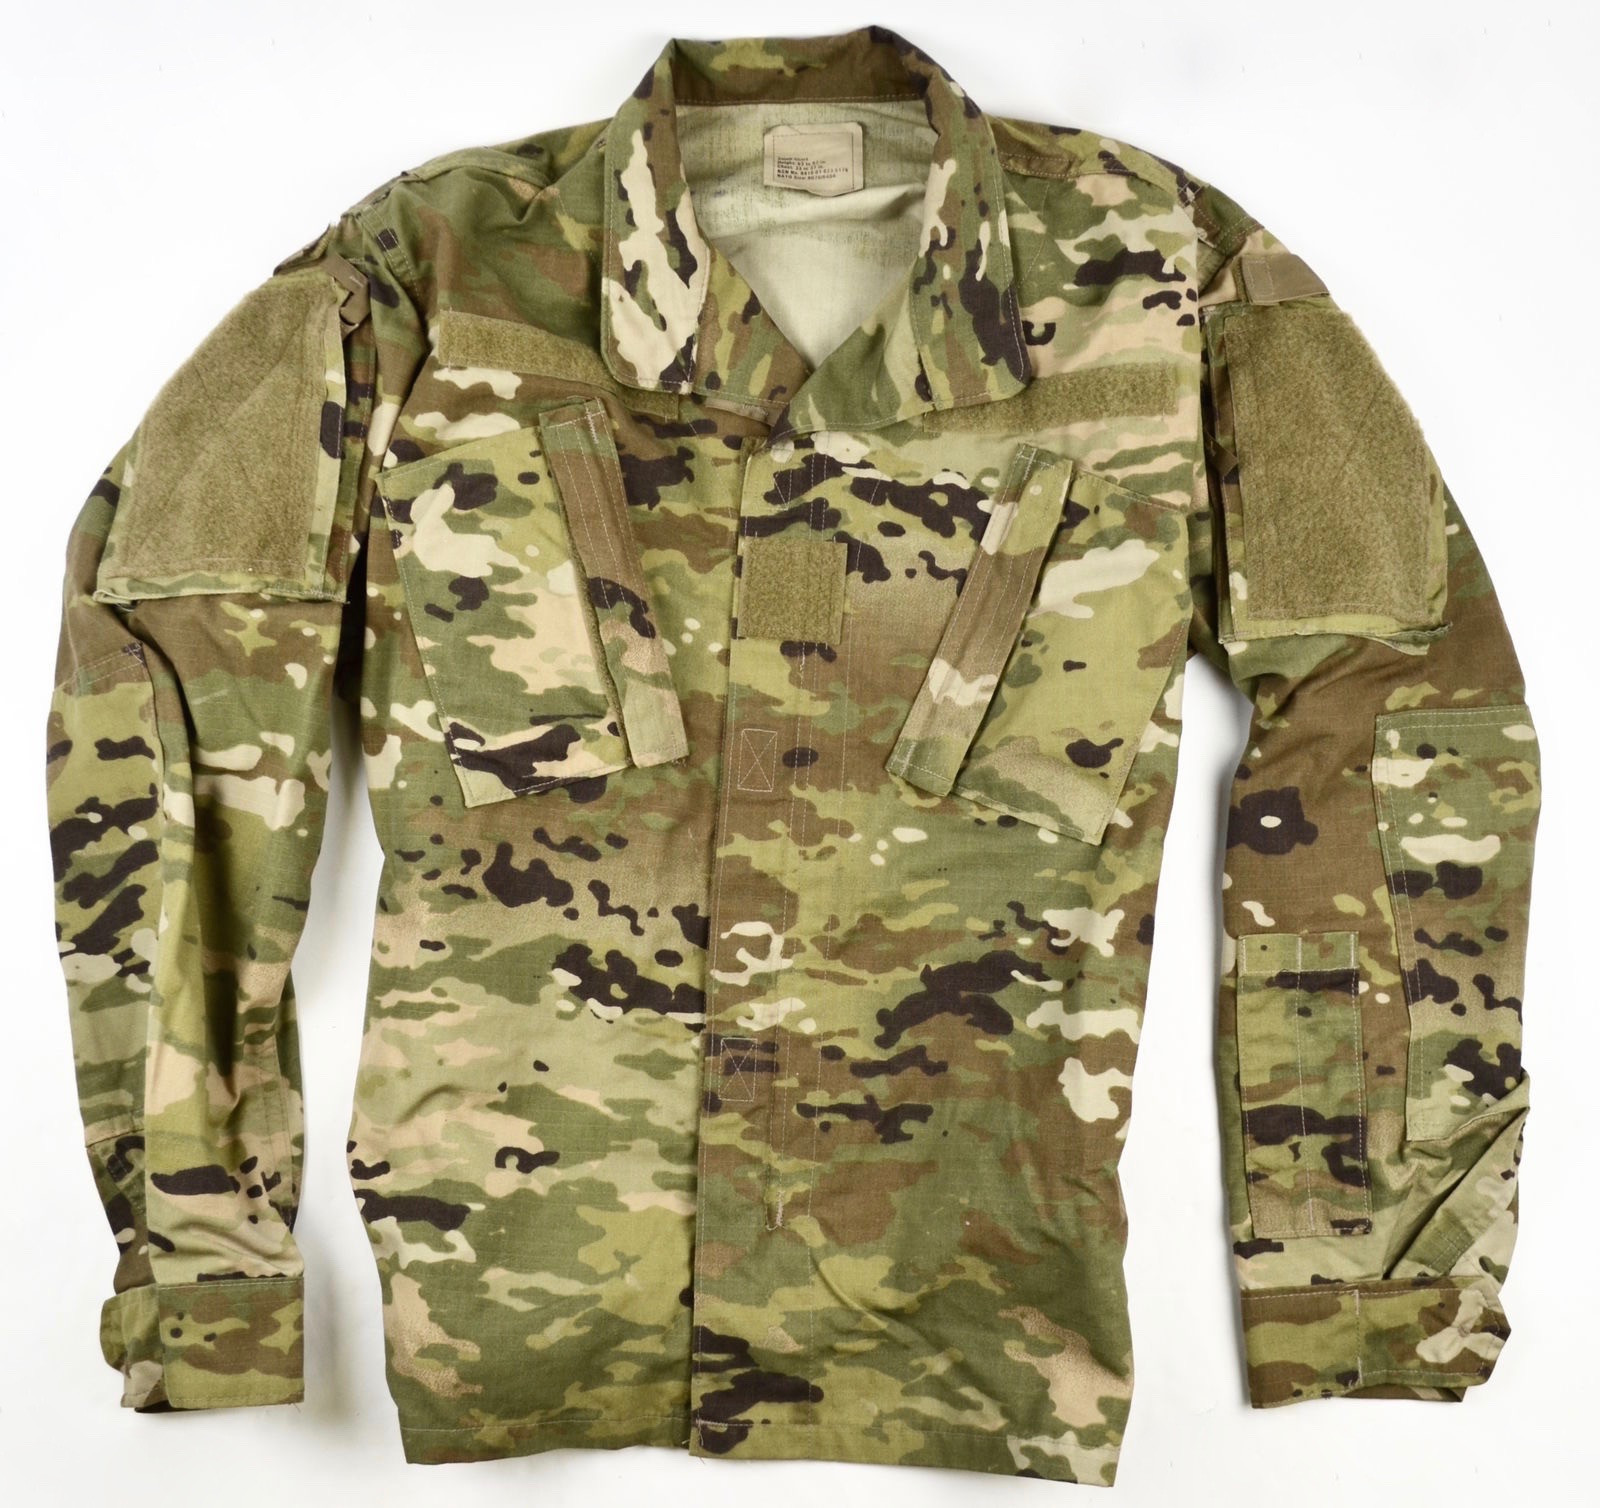 army usgi military uniform scorpion w2 ocp camo shirt pant mr medium